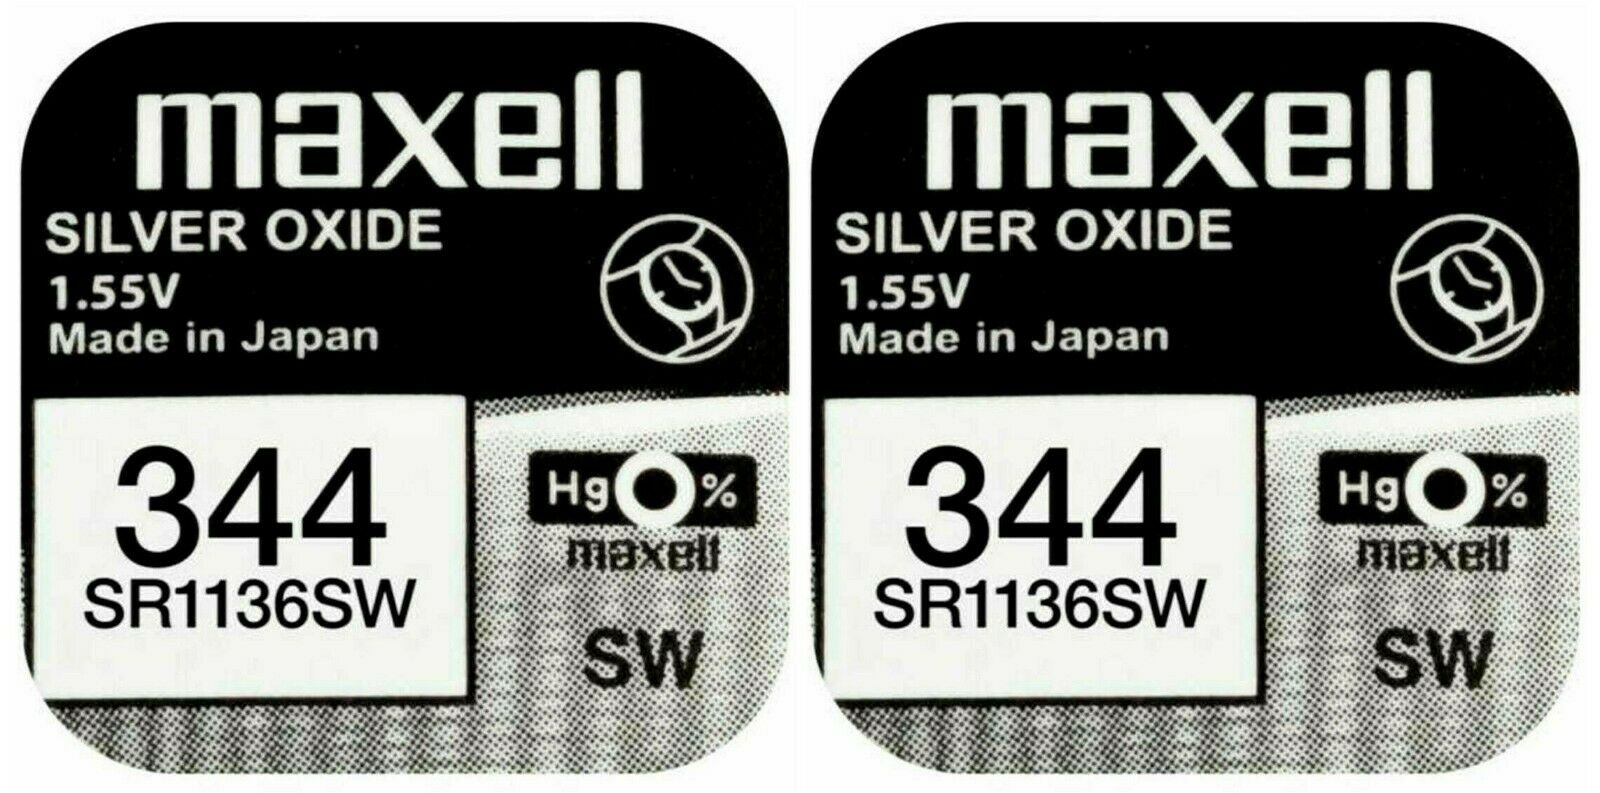 2 X Maxell 344 Stack Battery Clock Mercury Free Silver Oxide sr1136sw 1.55v